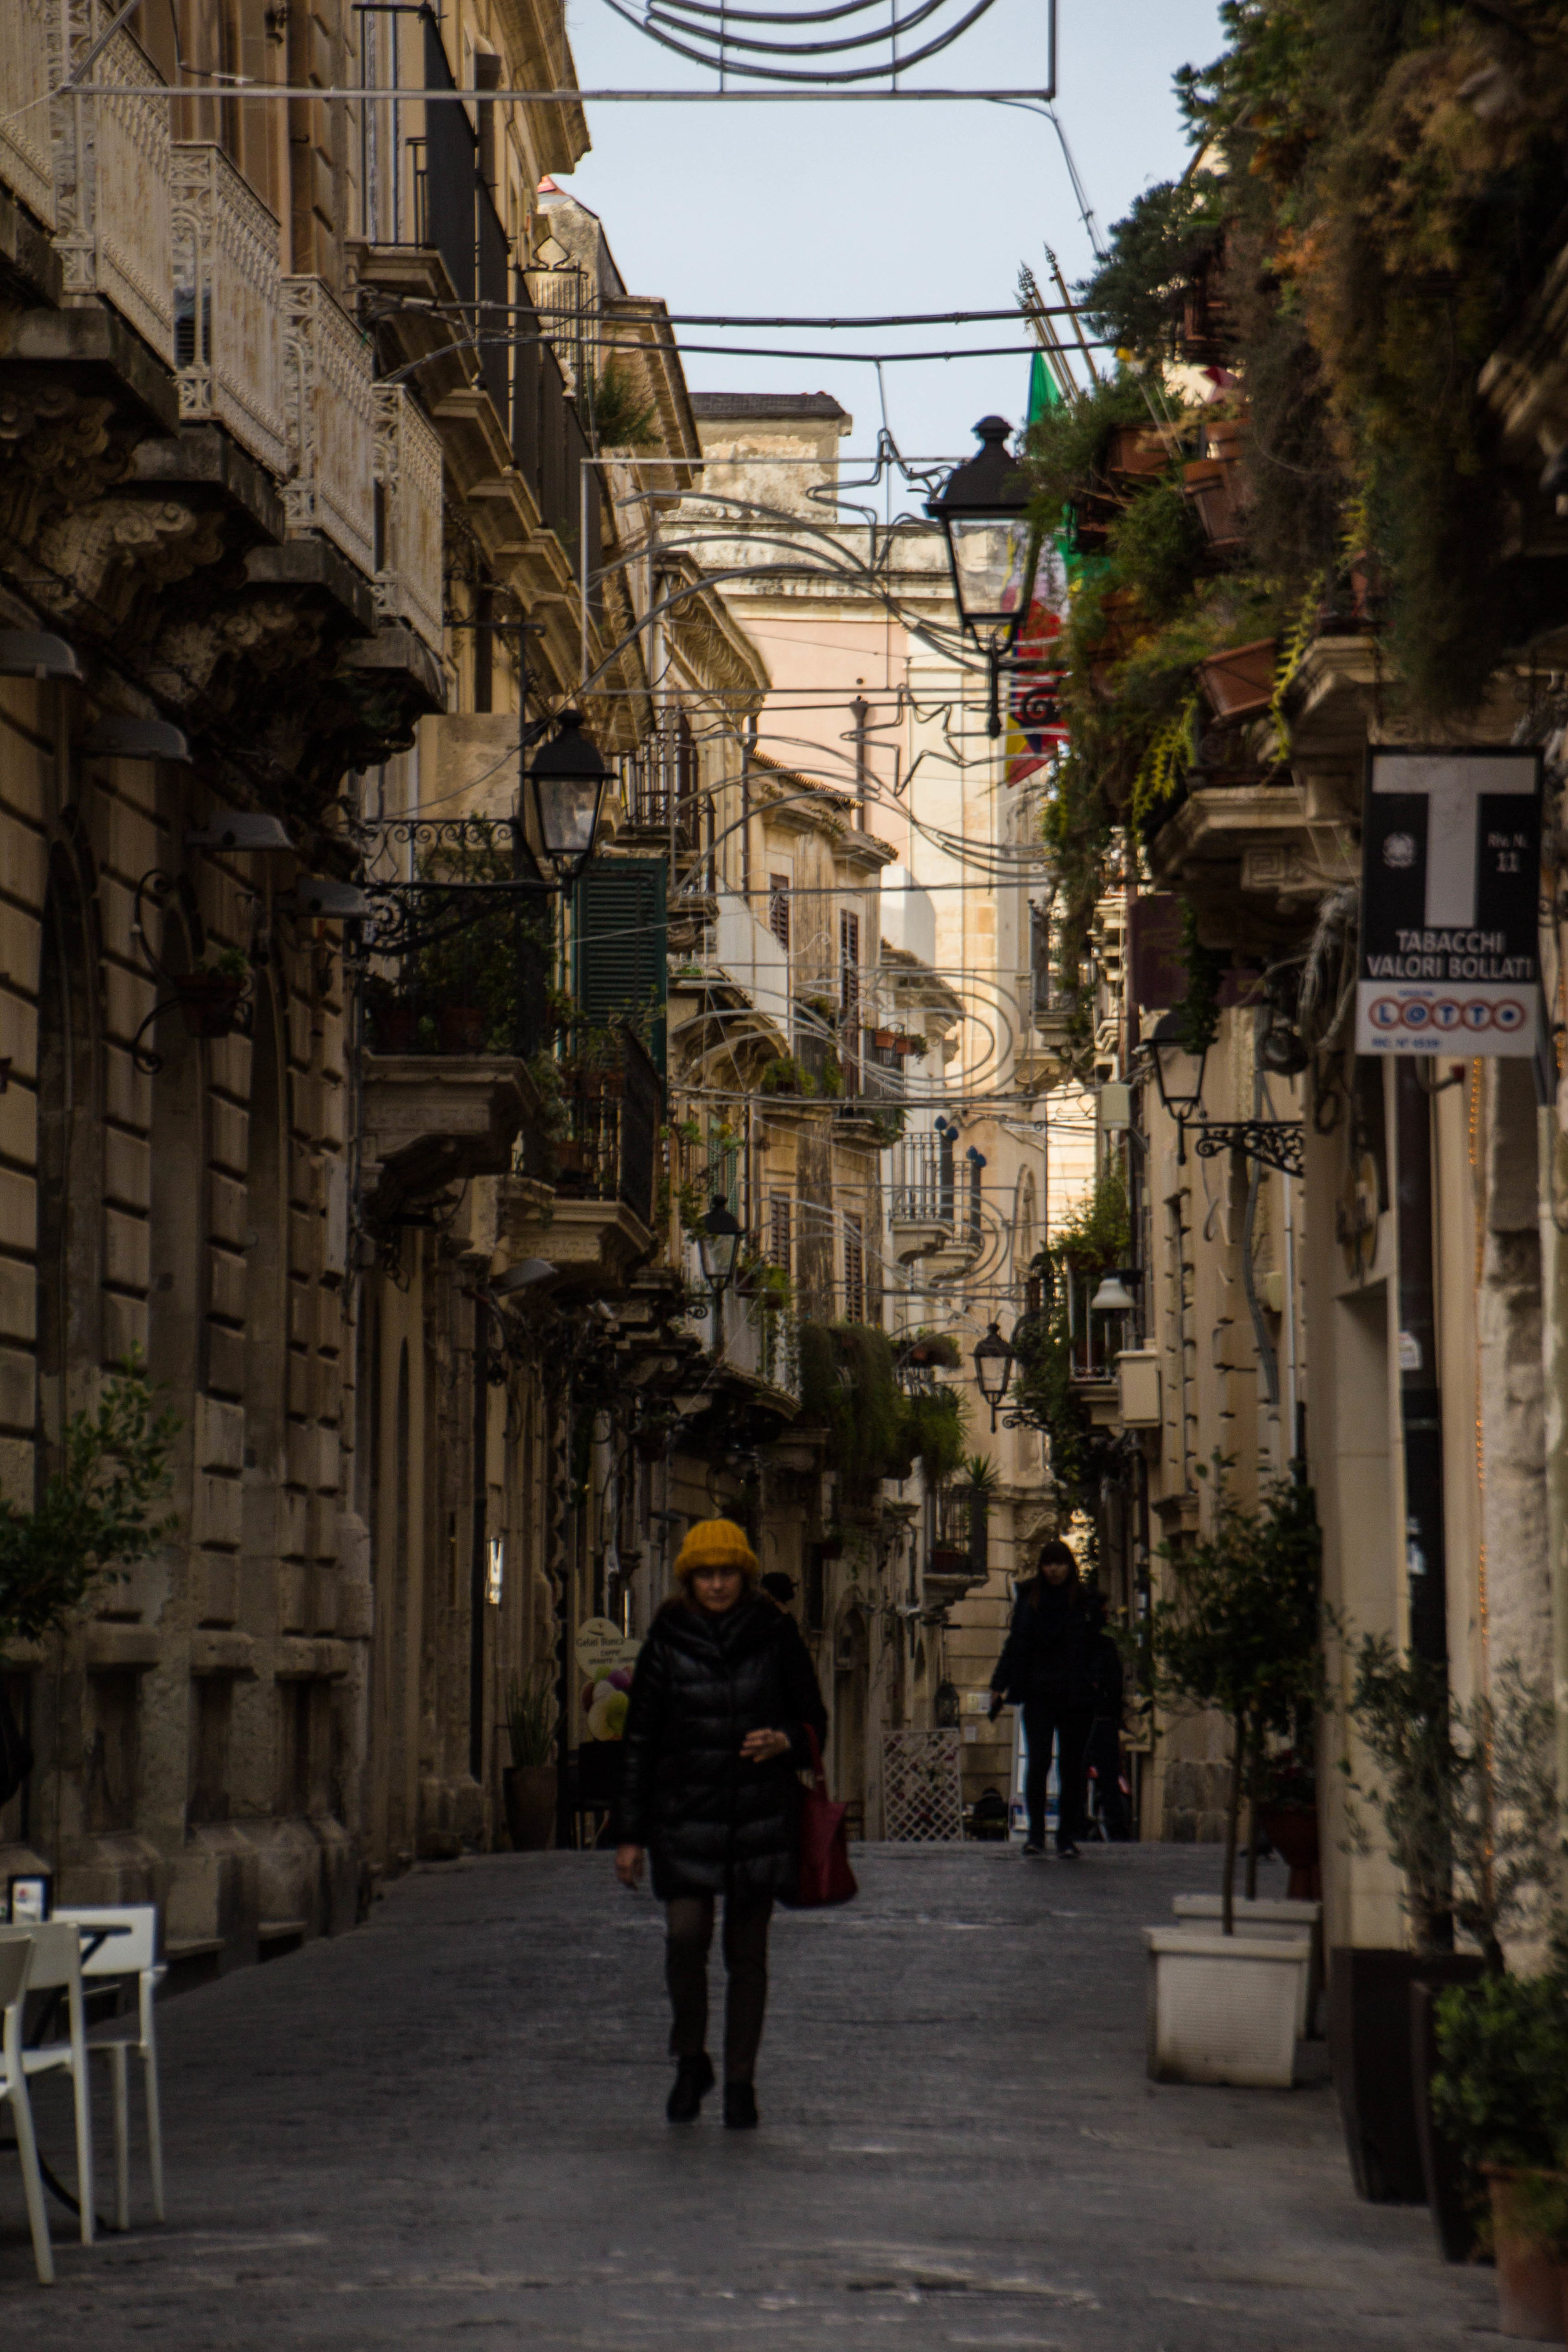 streets-ortygia-syracuse-sicily-40.jpg